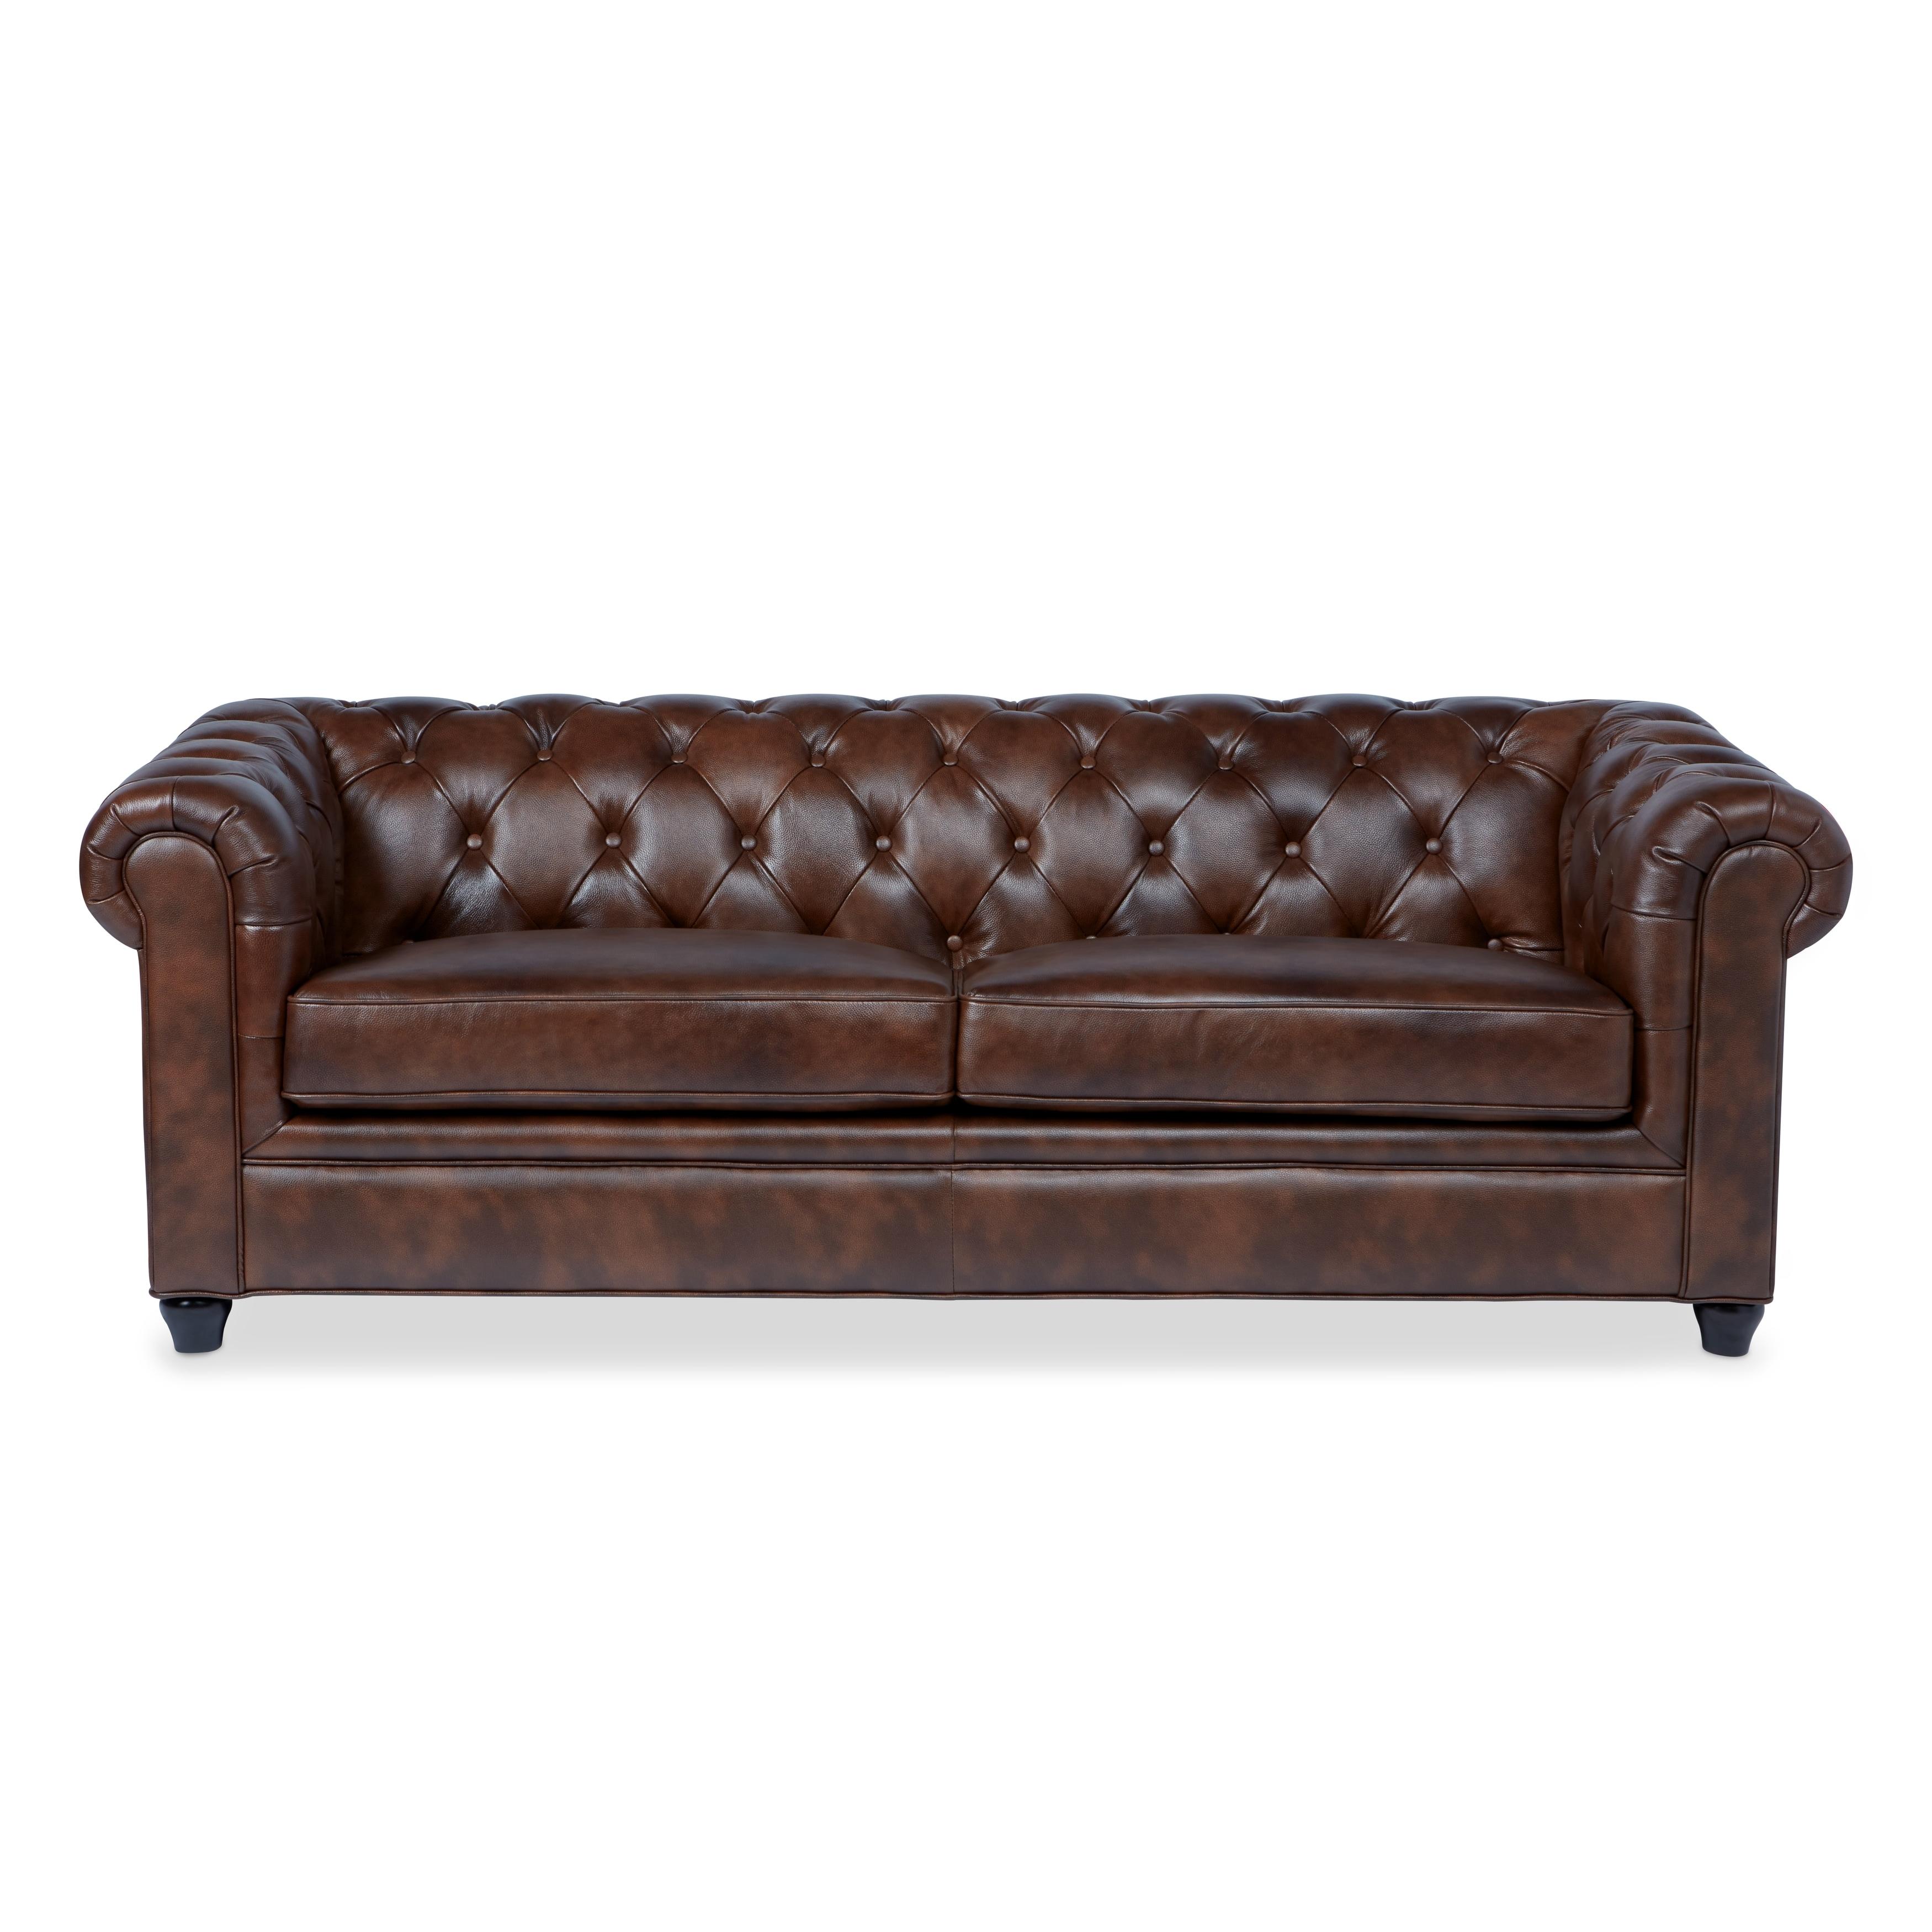 Cool Abbyson Tuscan Top Grain Leather Chesterfield Sofa Spiritservingveterans Wood Chair Design Ideas Spiritservingveteransorg